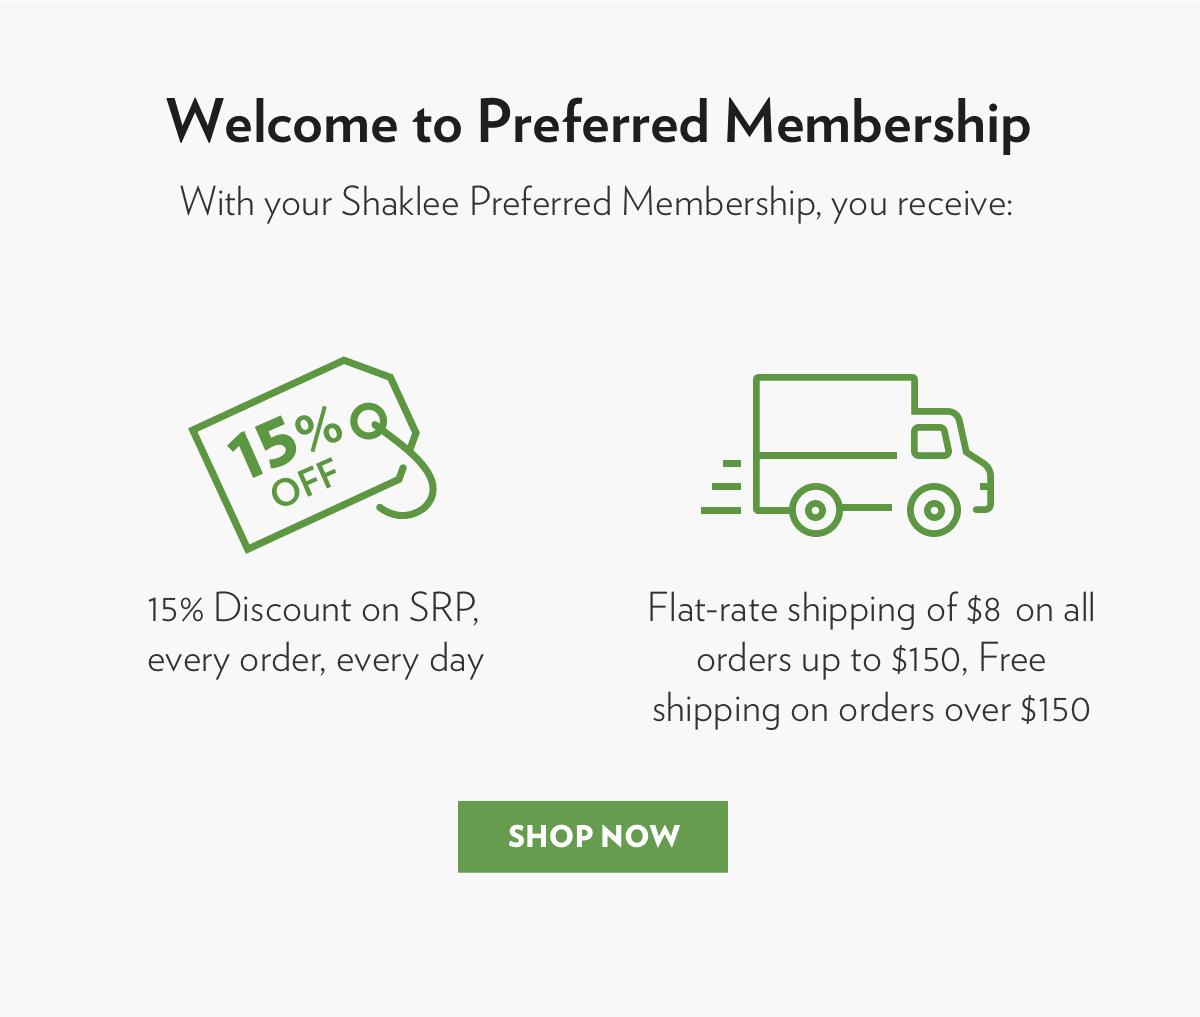 Preferred Membership